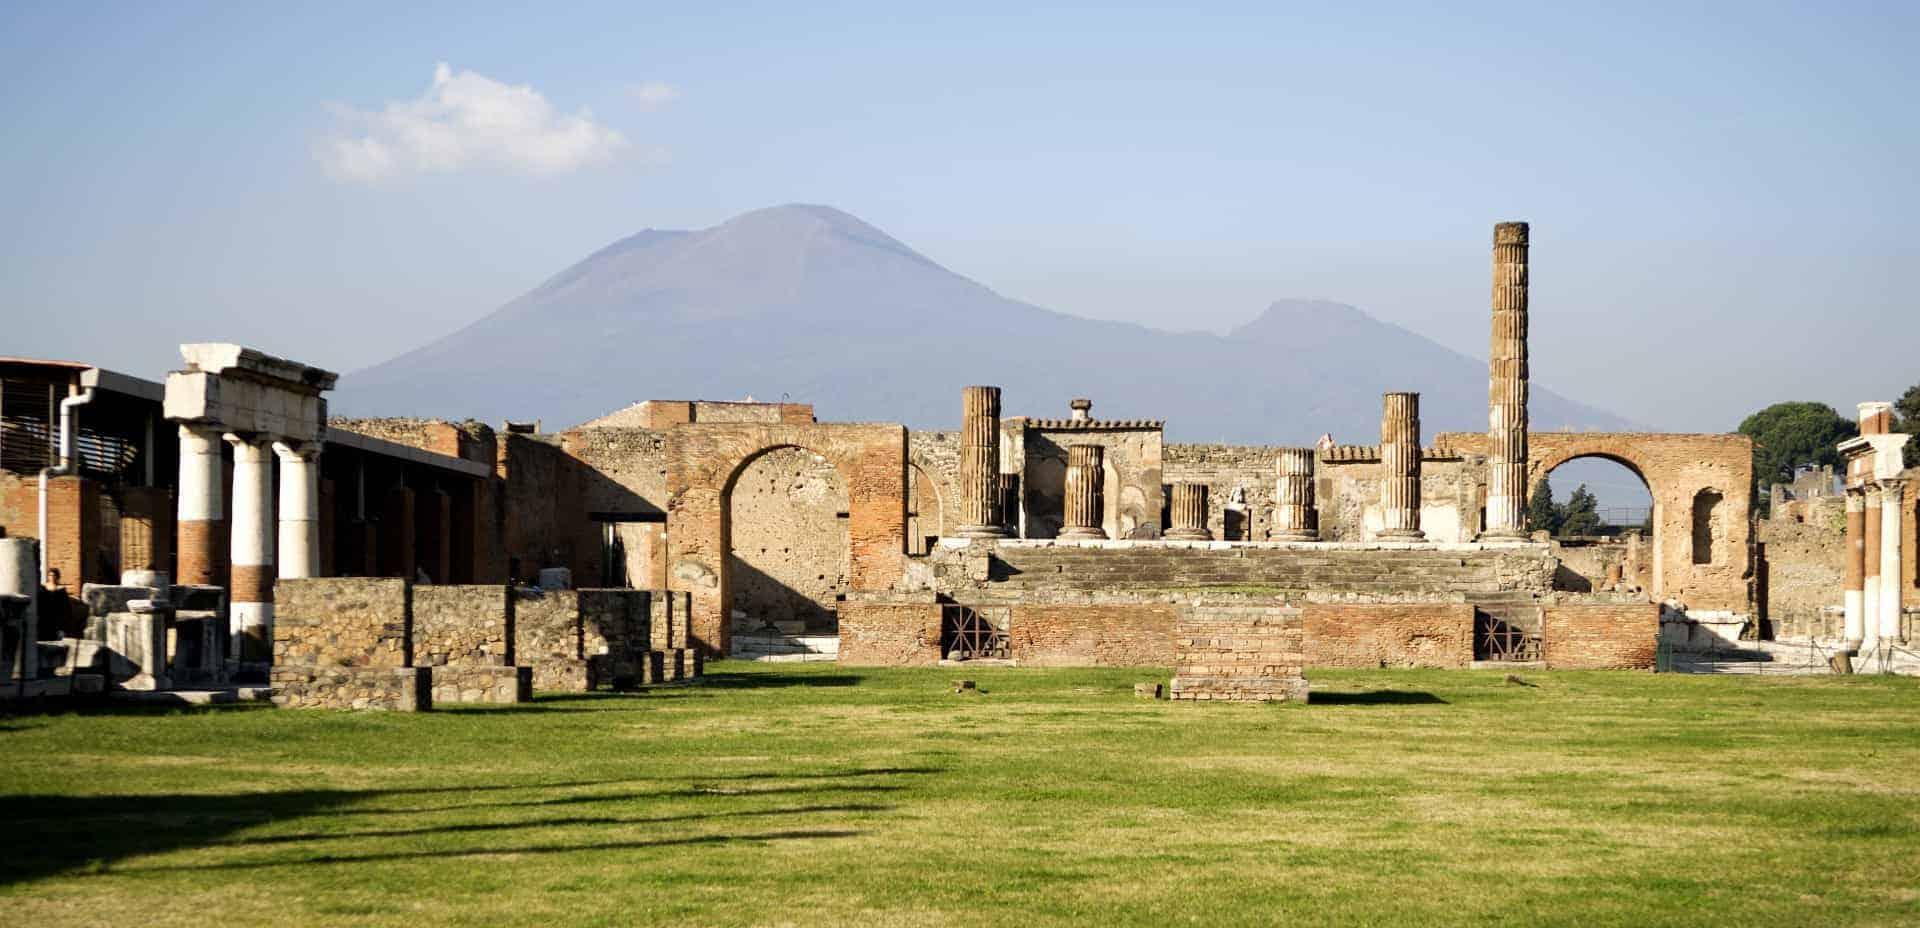 Pompeii, Mount Vesuvius, Italy